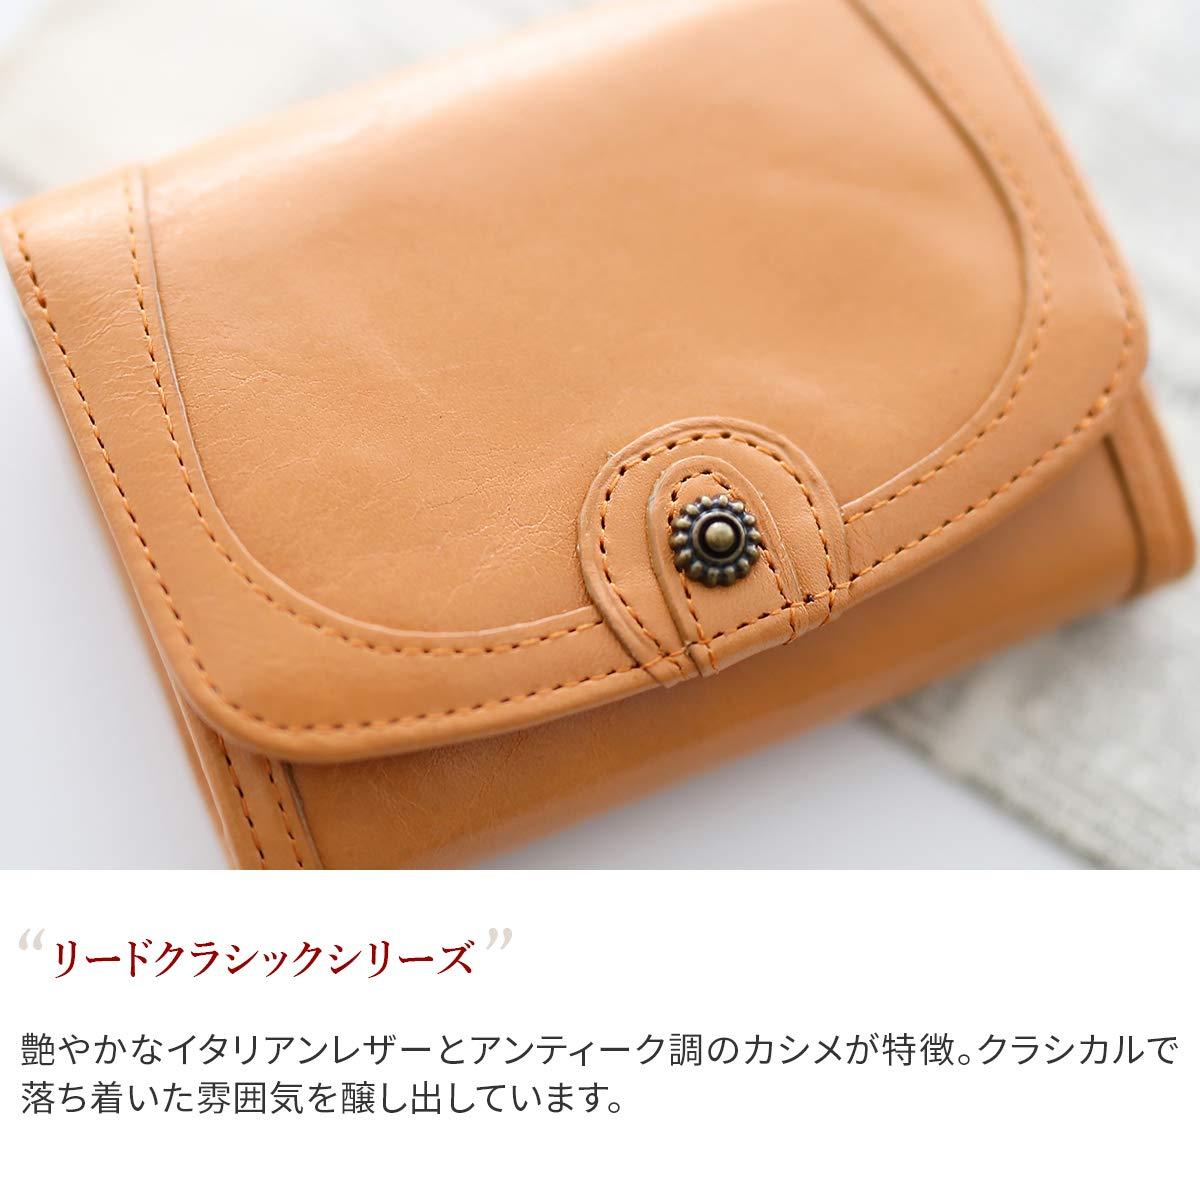 bf6a13cf8611 Amazon   [ダコタ] Dakota 二つ折り財布 0036206 (0030006) リードクラシックシリーズ ブラック  DA-32006-10   財布